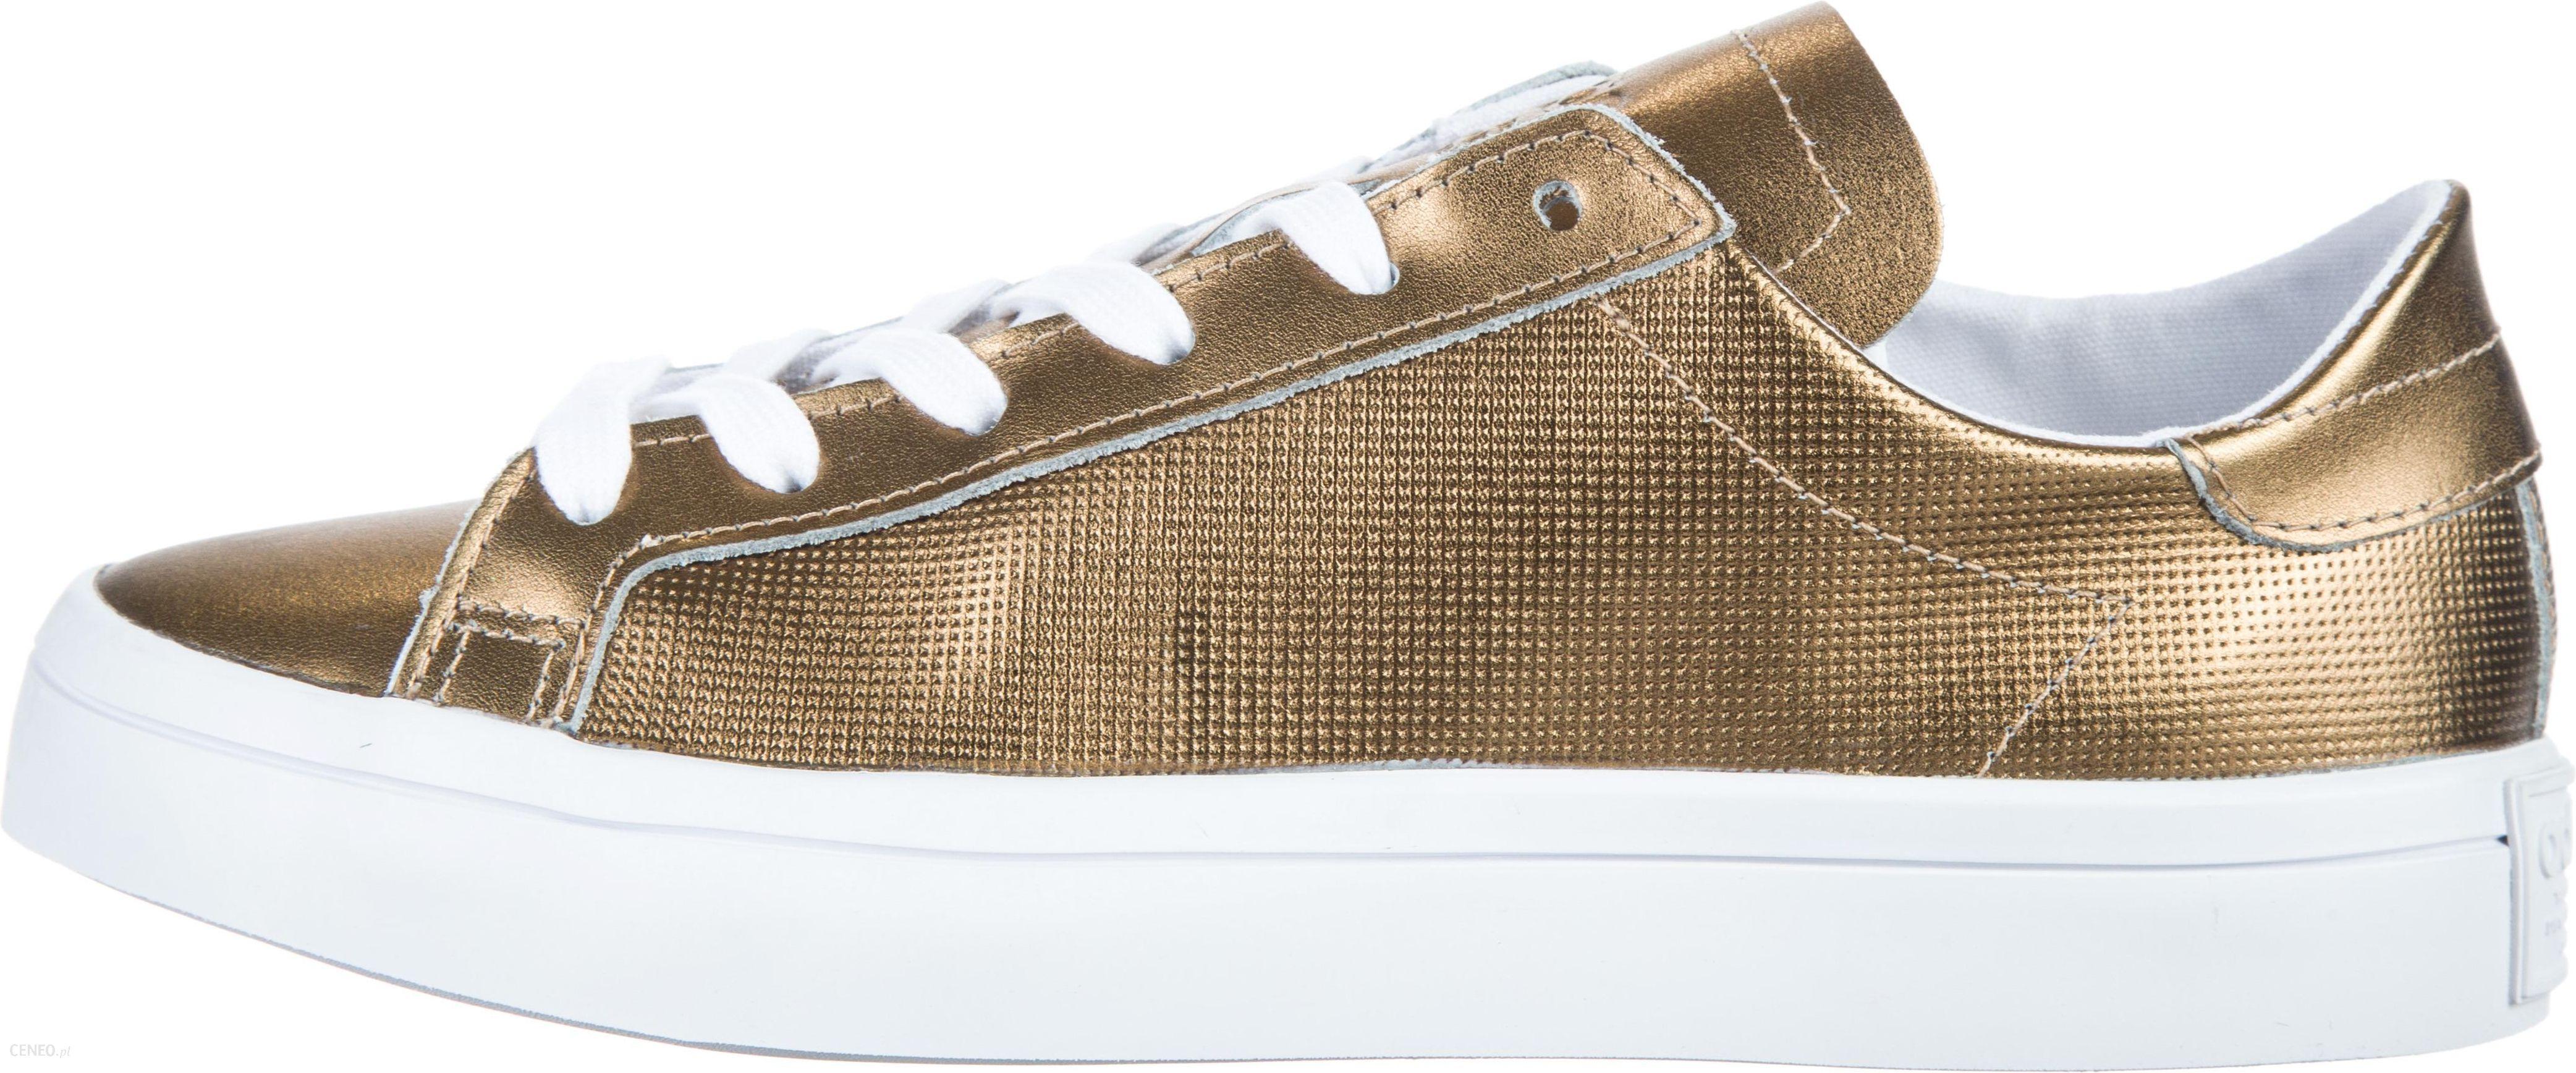 competitive price 63531 26701 adidas Originals Court Vantage Tenisówki Złoty 37 13 - zdjęcie 1